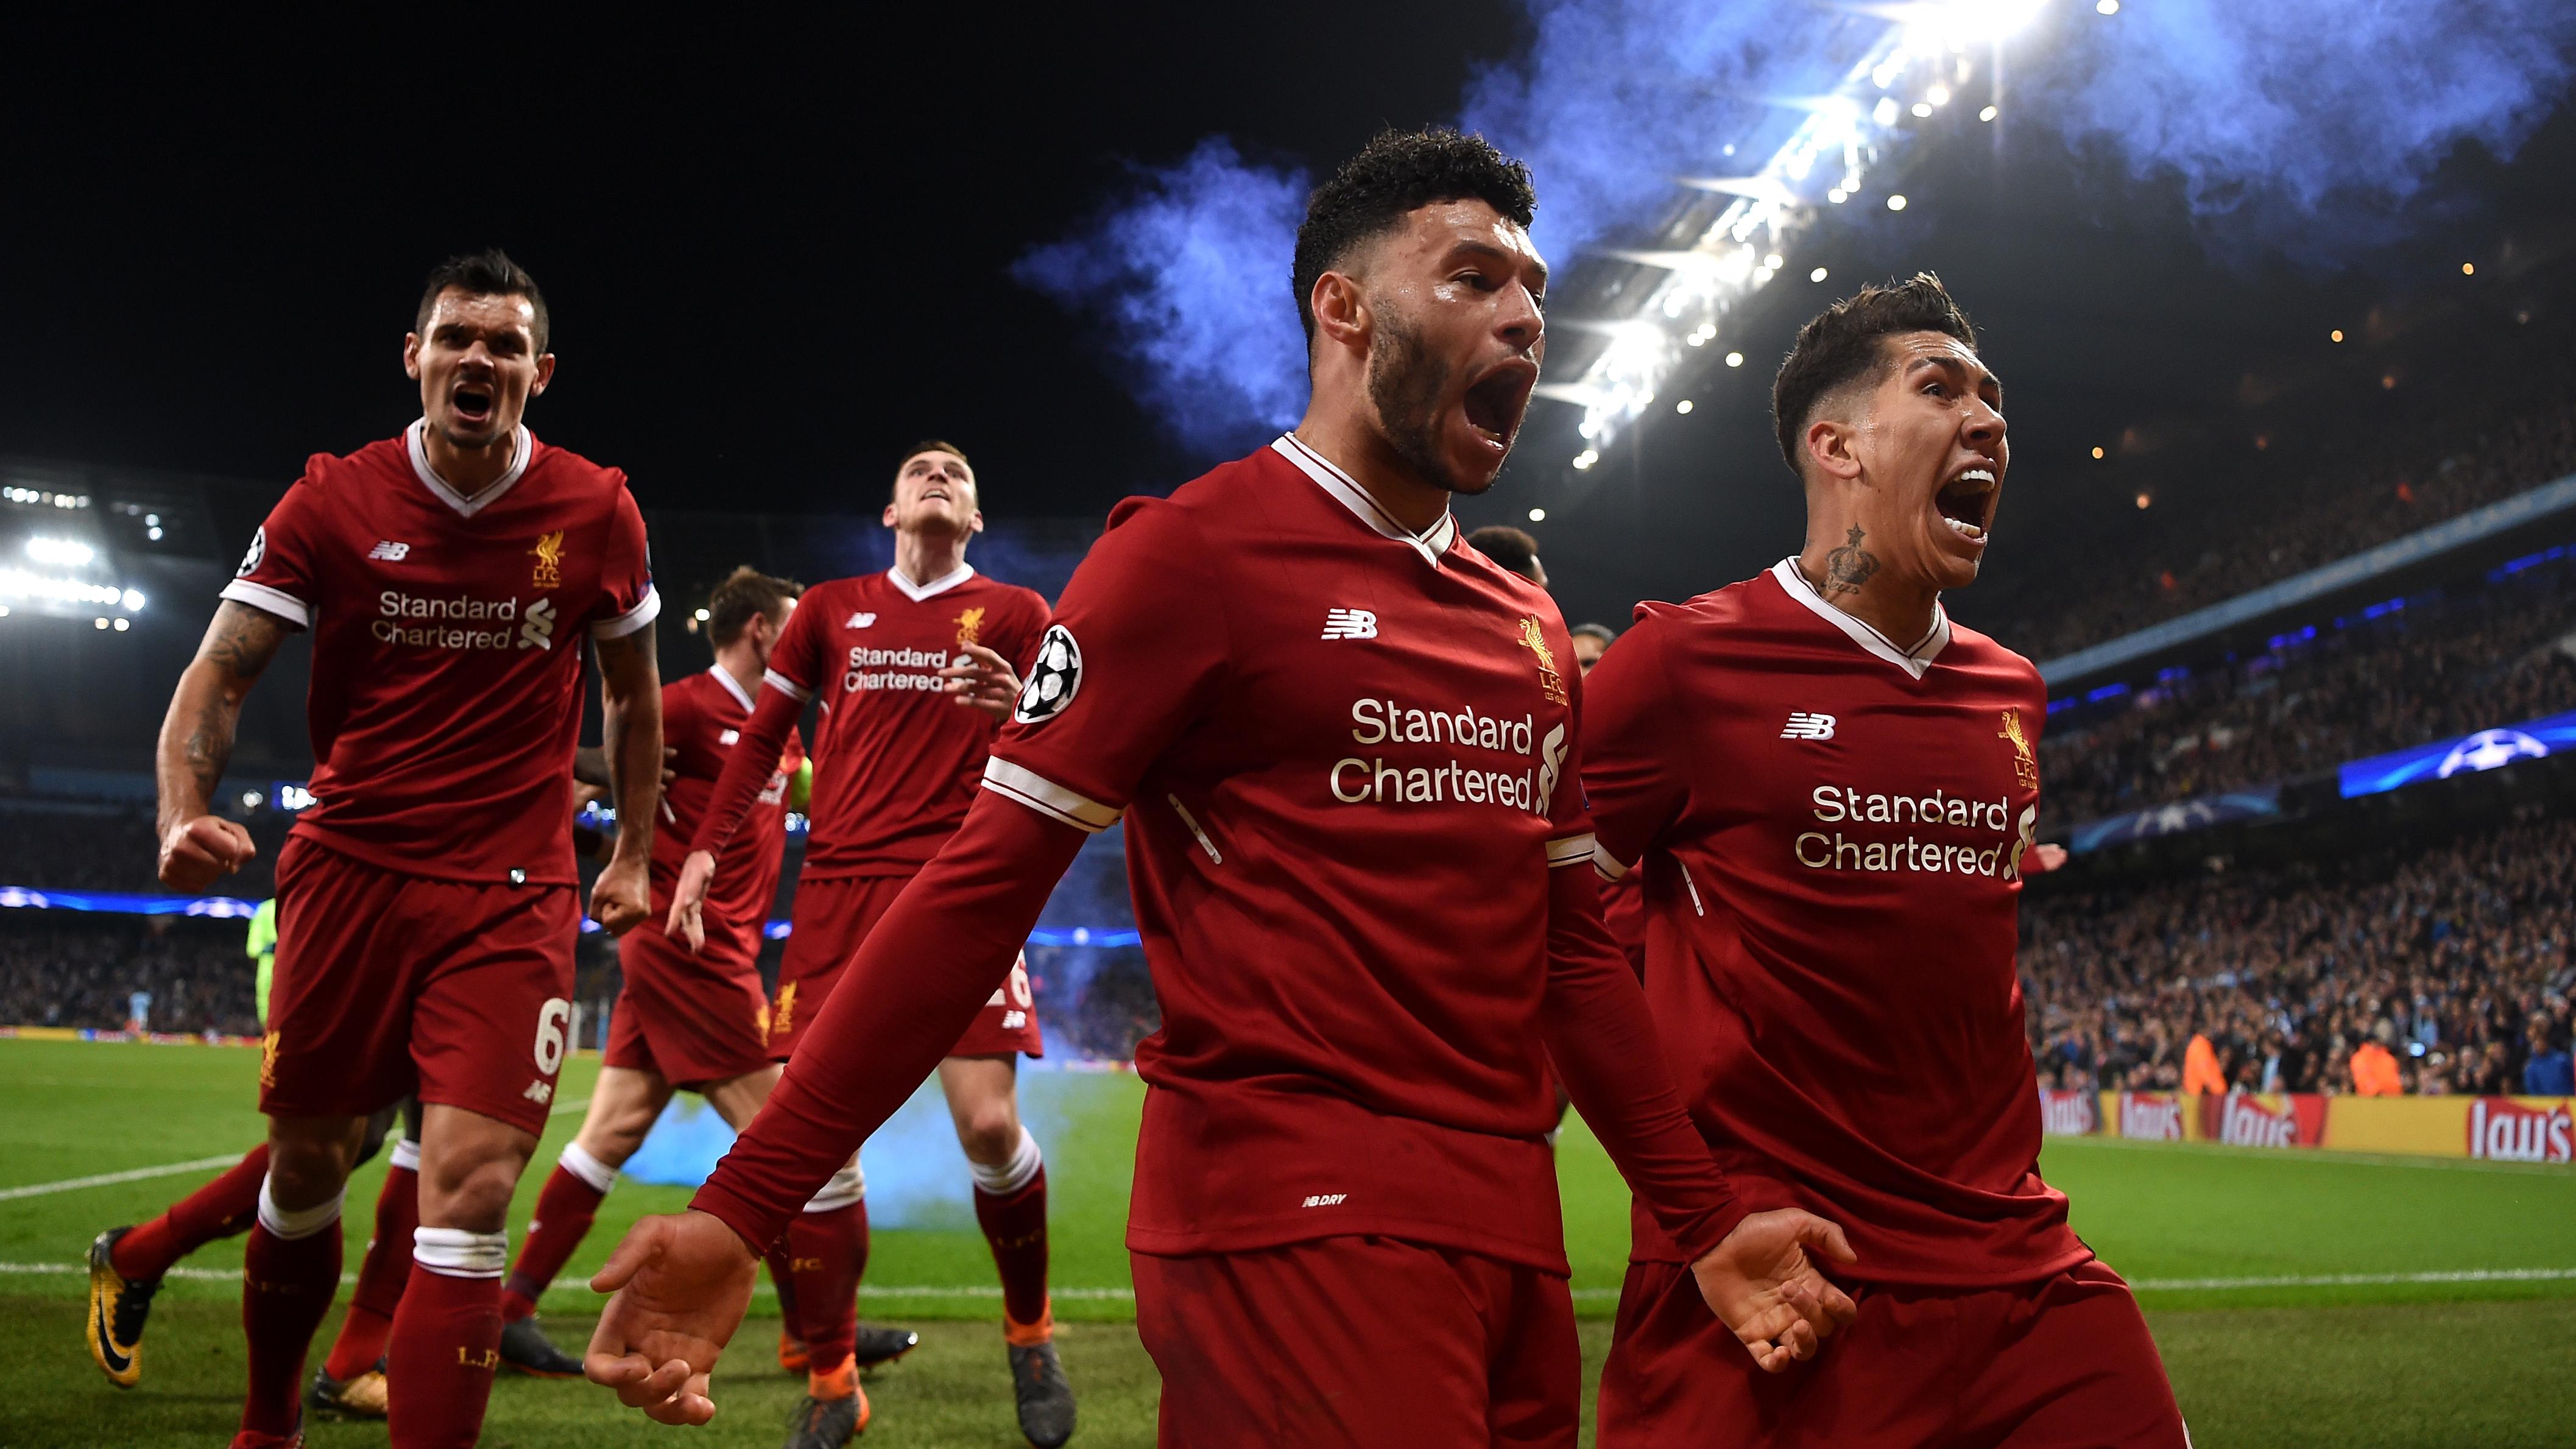 Oxlade-Chamberlain y Firmino celebran un gol ante el Manchester City en Champions League. (Getty)